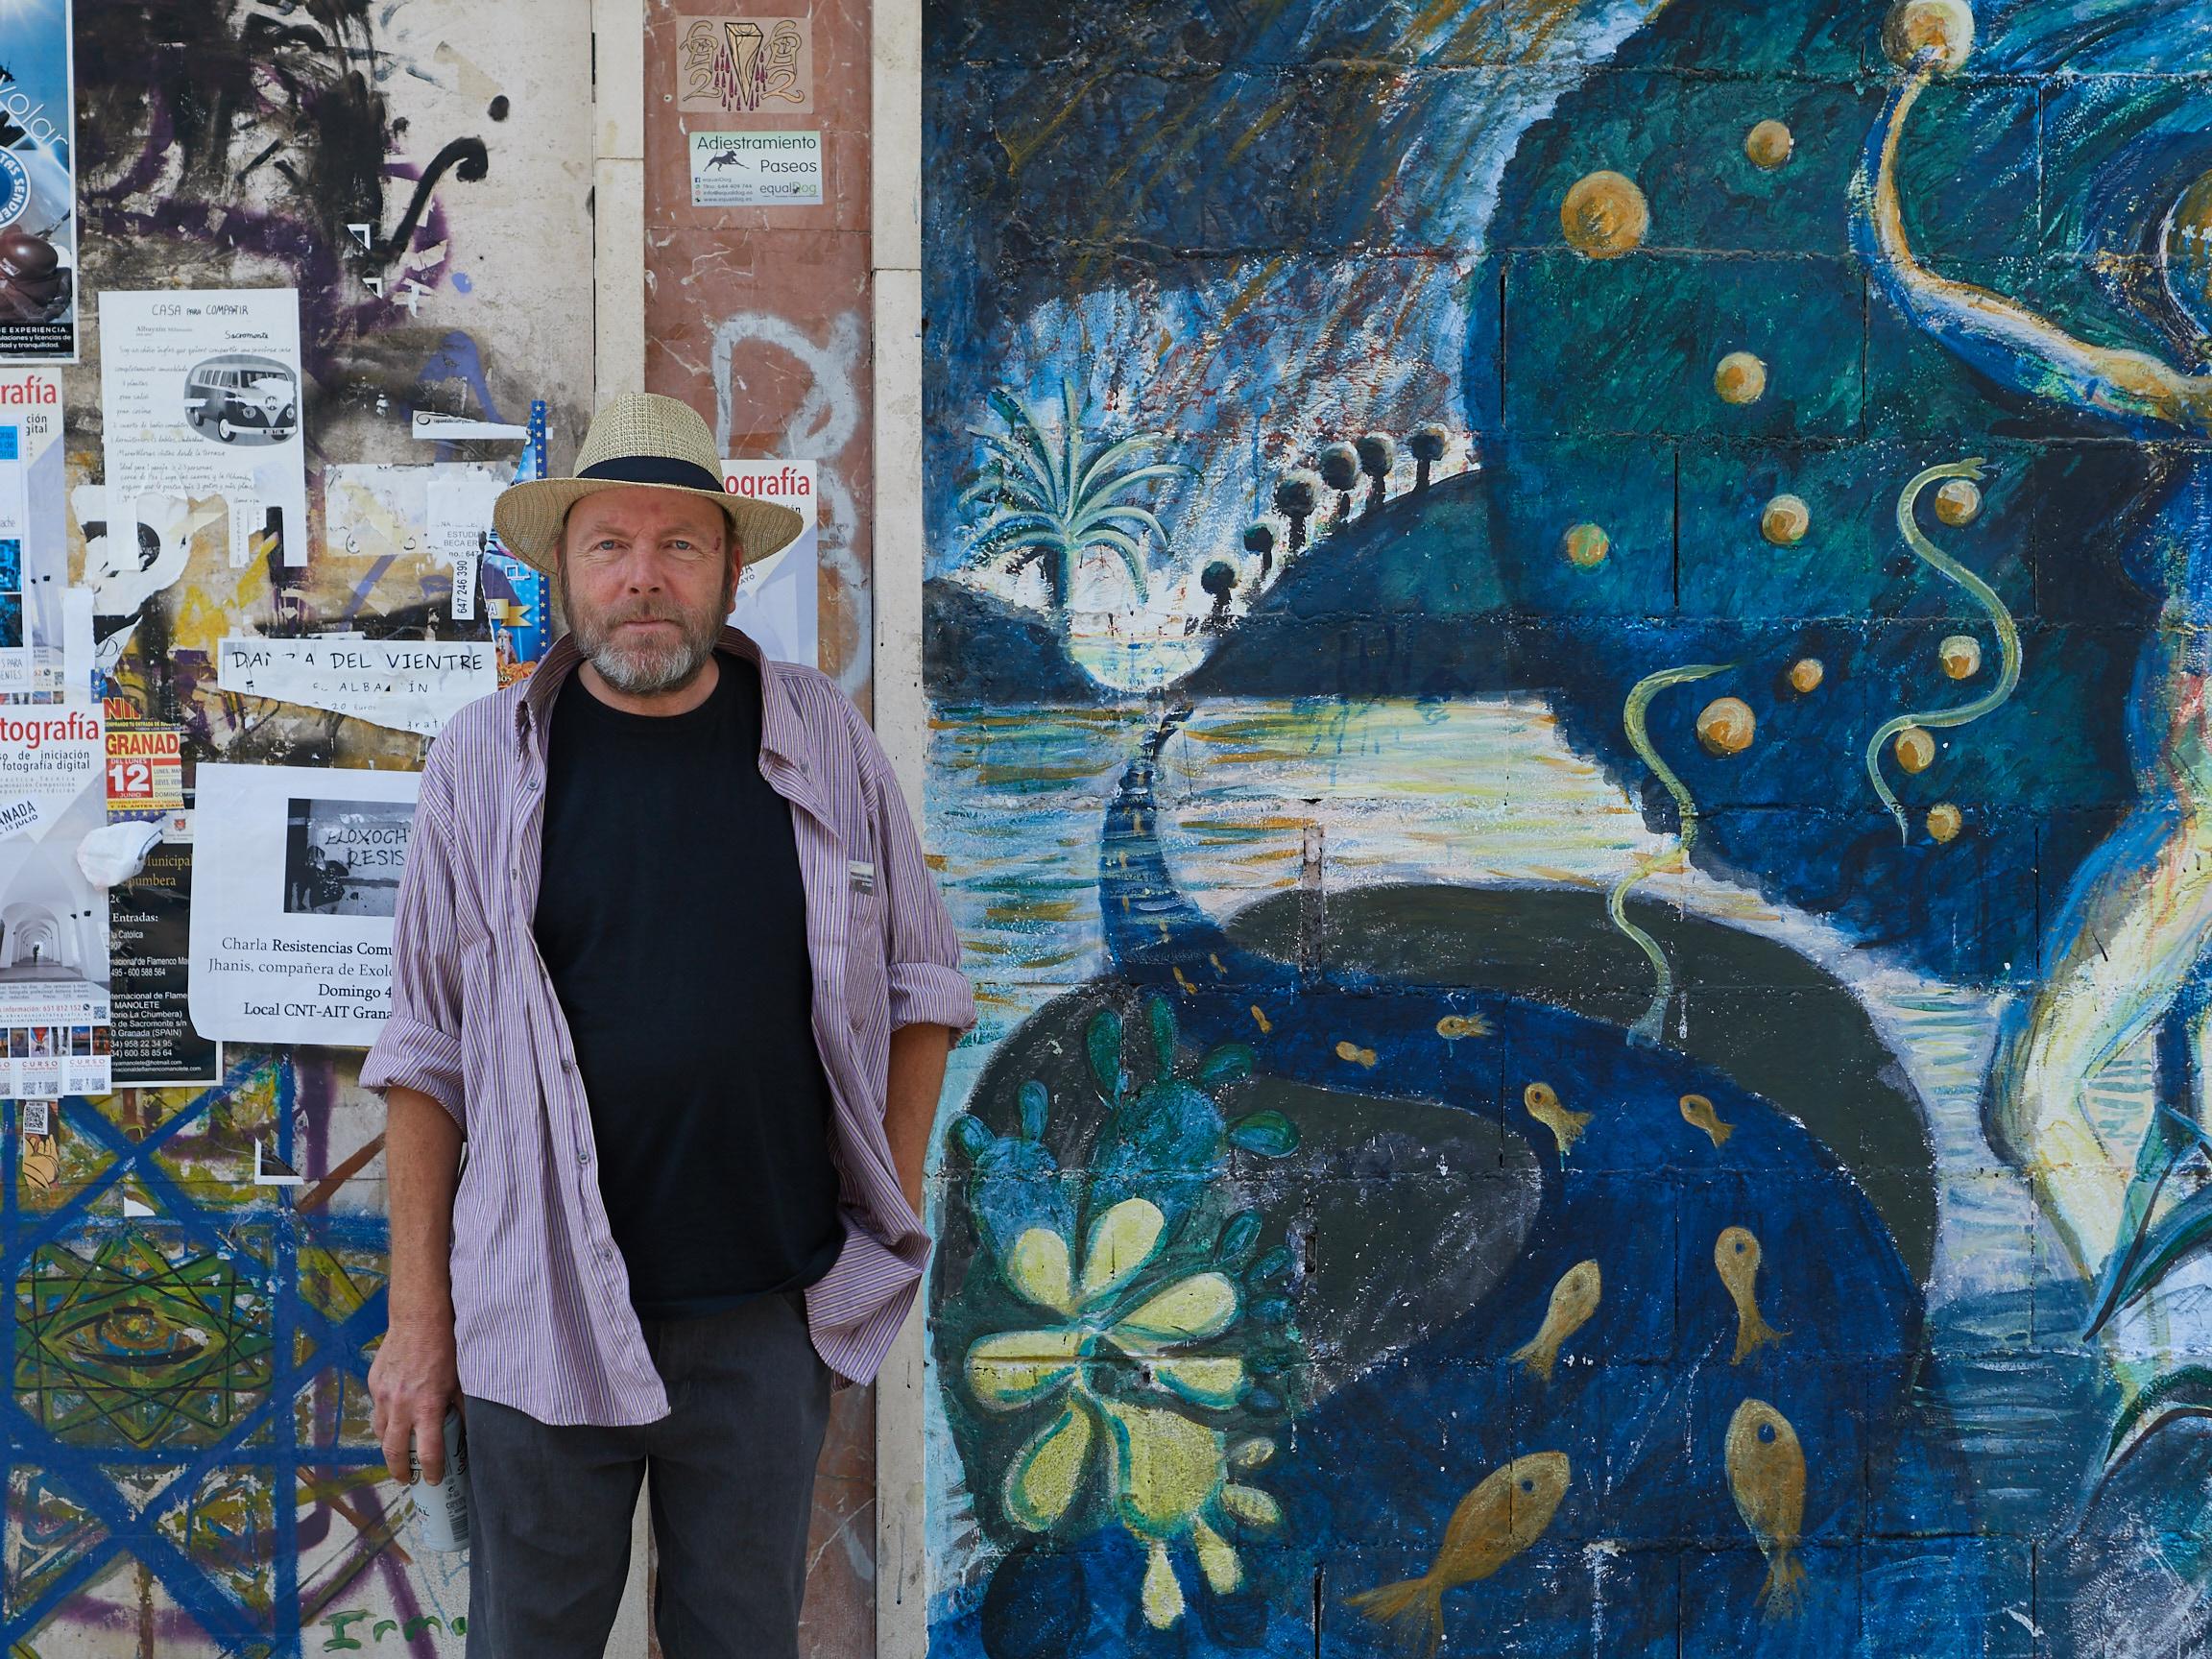 John vor seinem Wandbild am Plaza Nueva (2017)